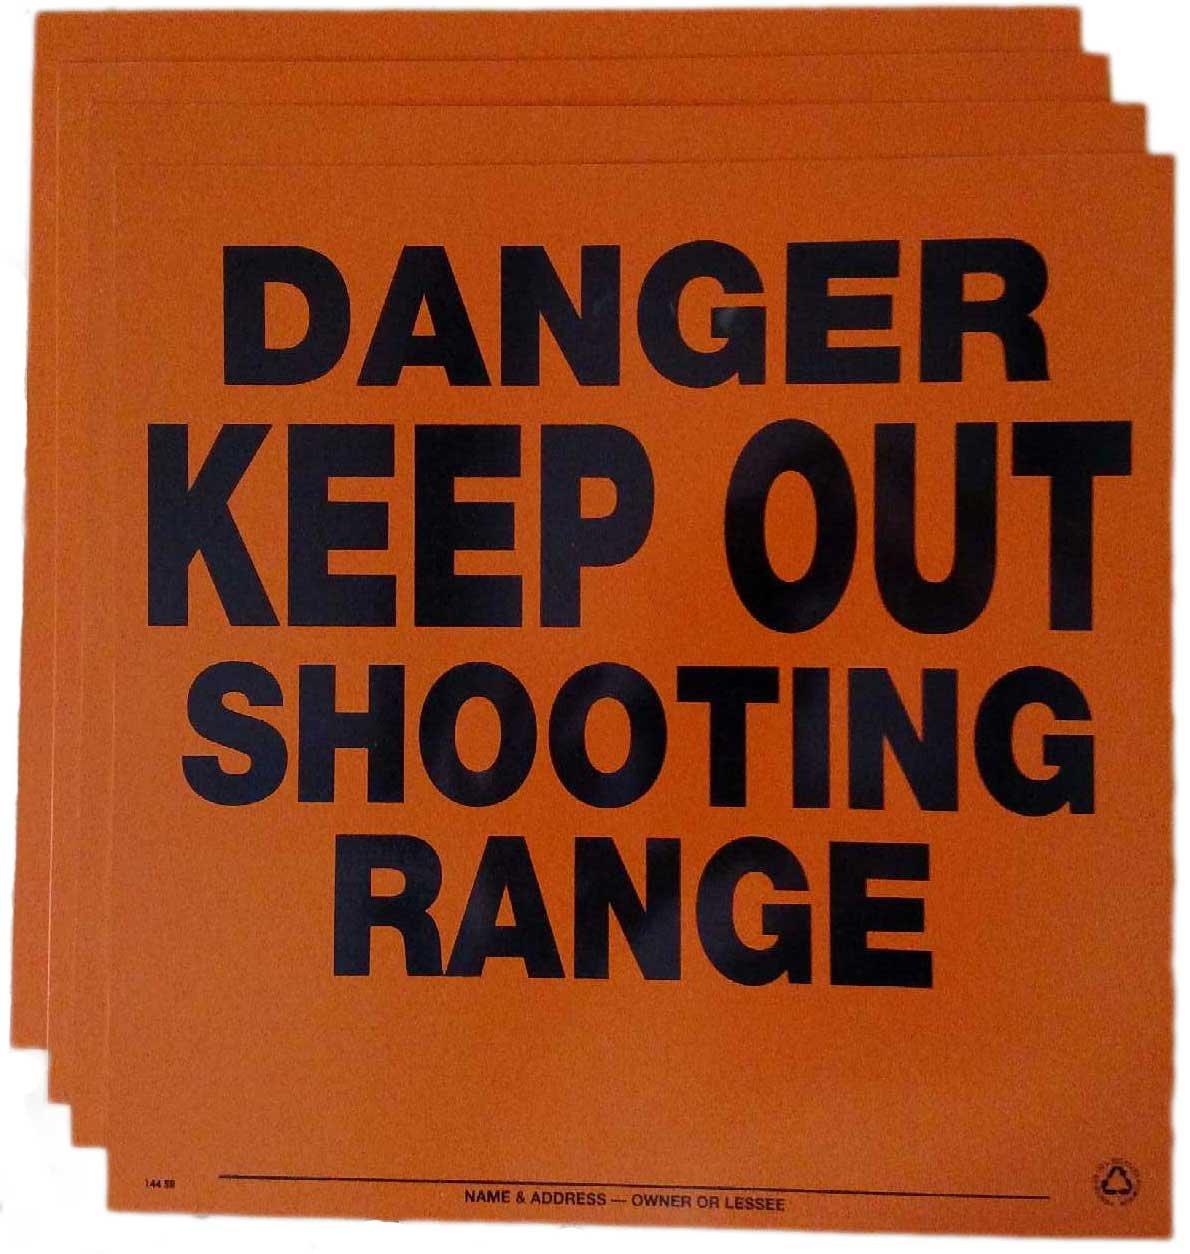 Aluminum Danger Keep Out Shooting Range Sign x50 (Orange)